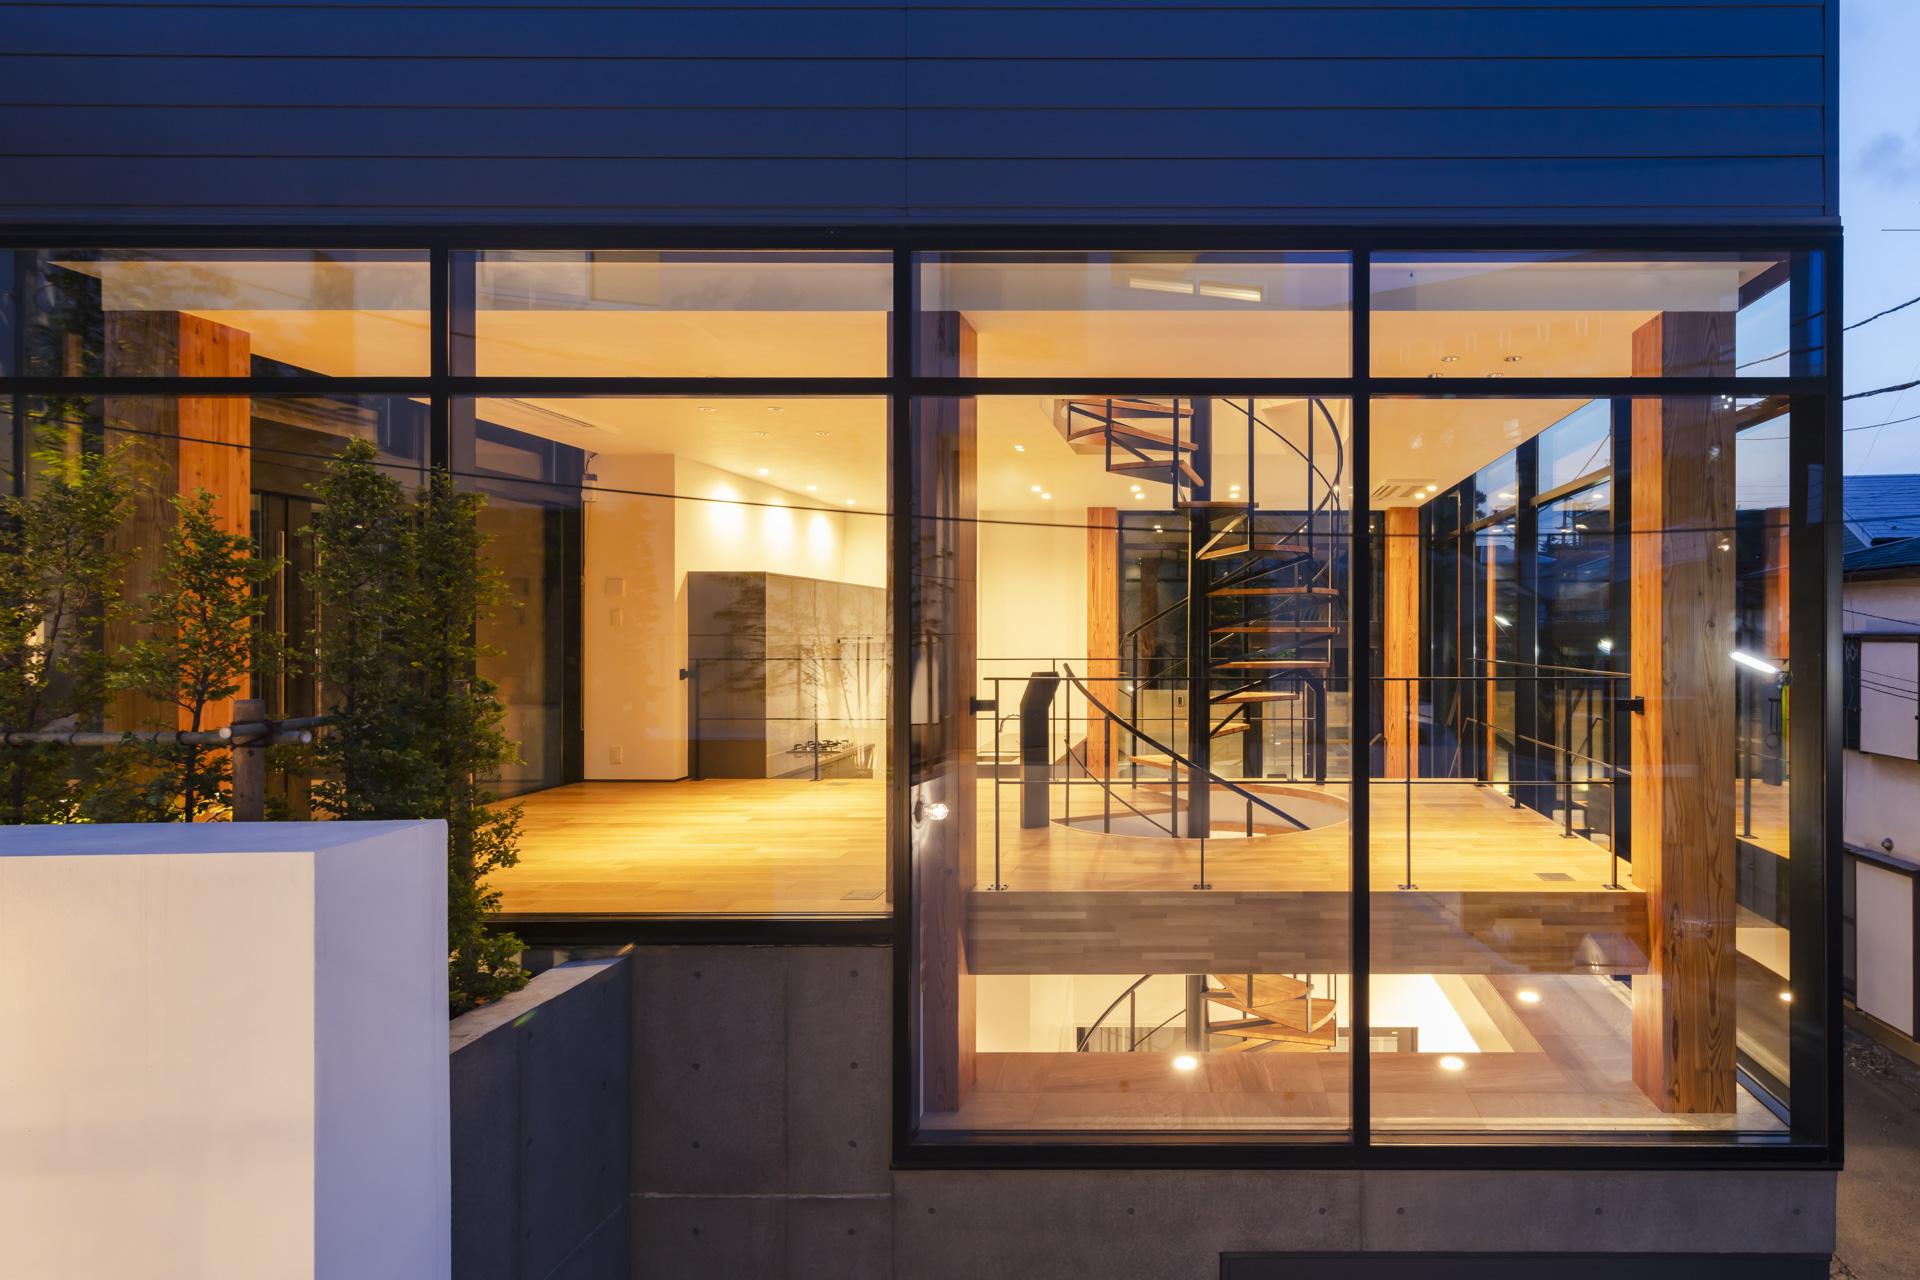 空環境計画 | KUU Architect & Associates